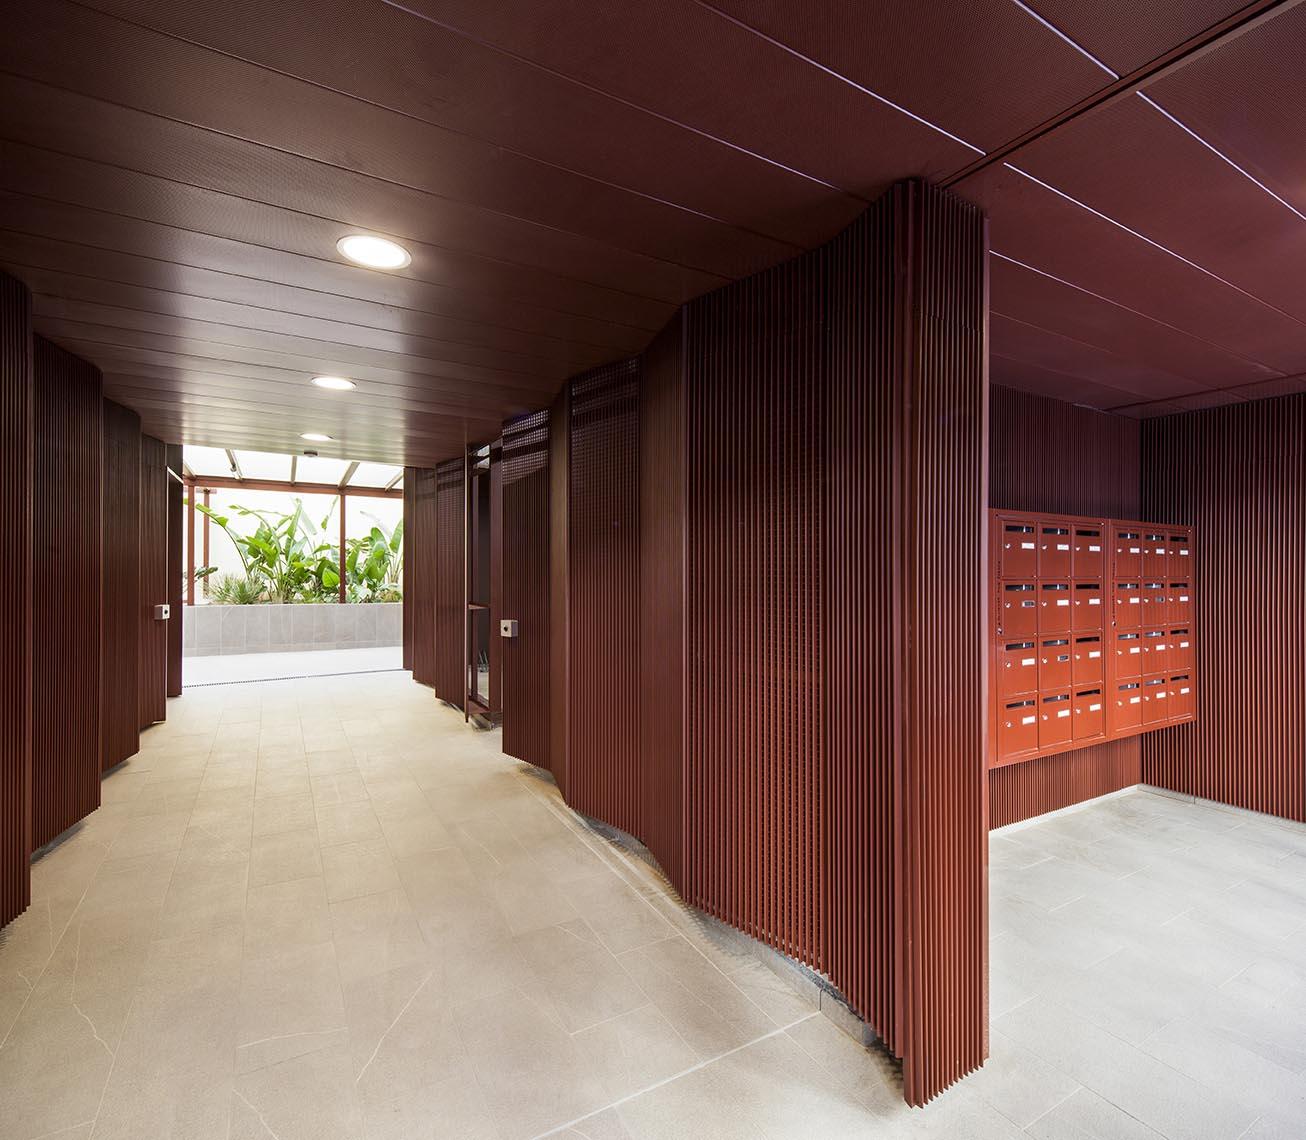 billy-goffard-architecte COMBOUL architecture 06 paca residence social